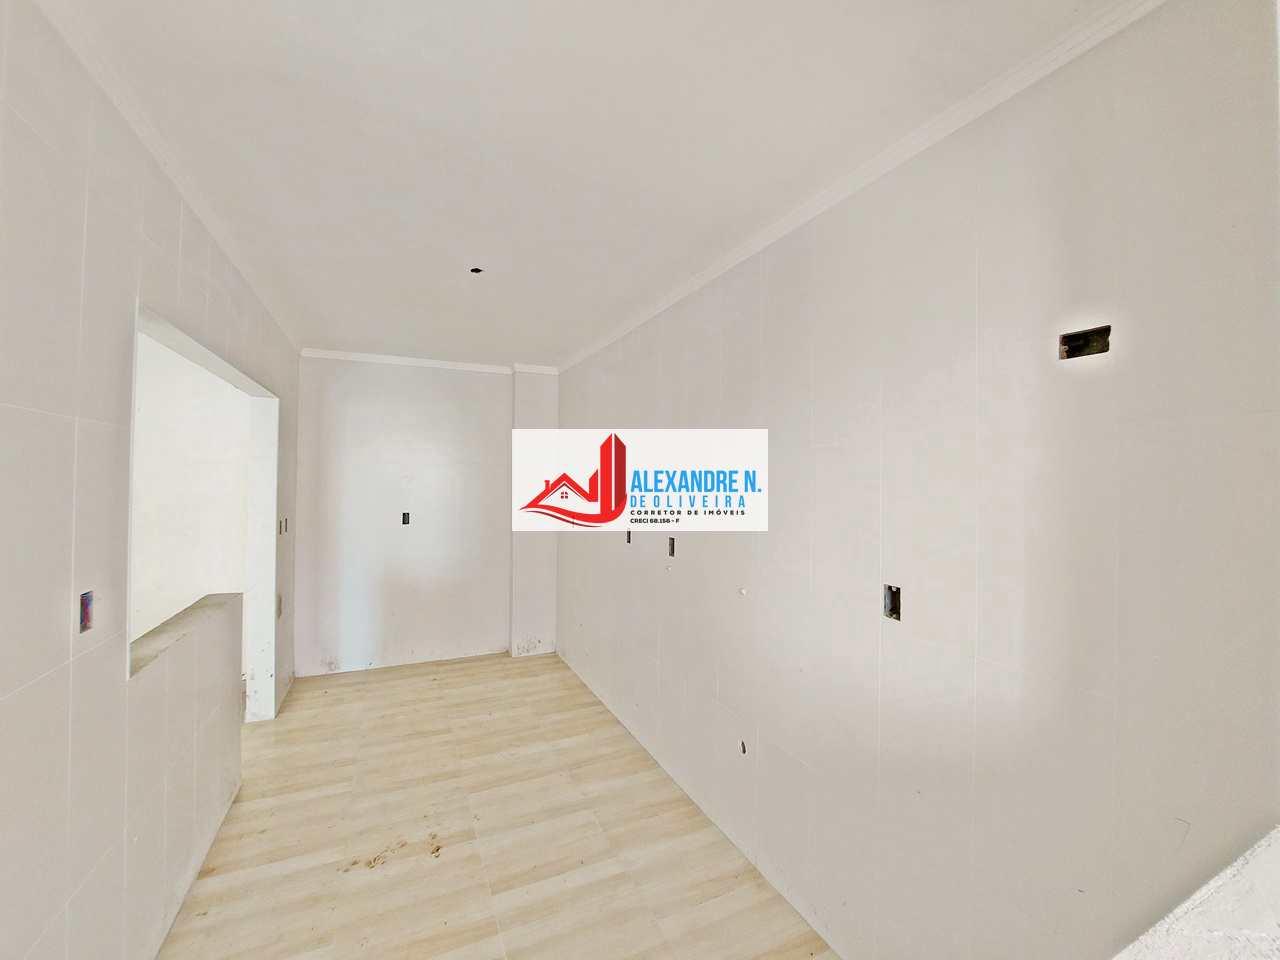 Apto 3 dorms, Caiçara, Praia Grande, Entr. R$ 50 mil, AP00528